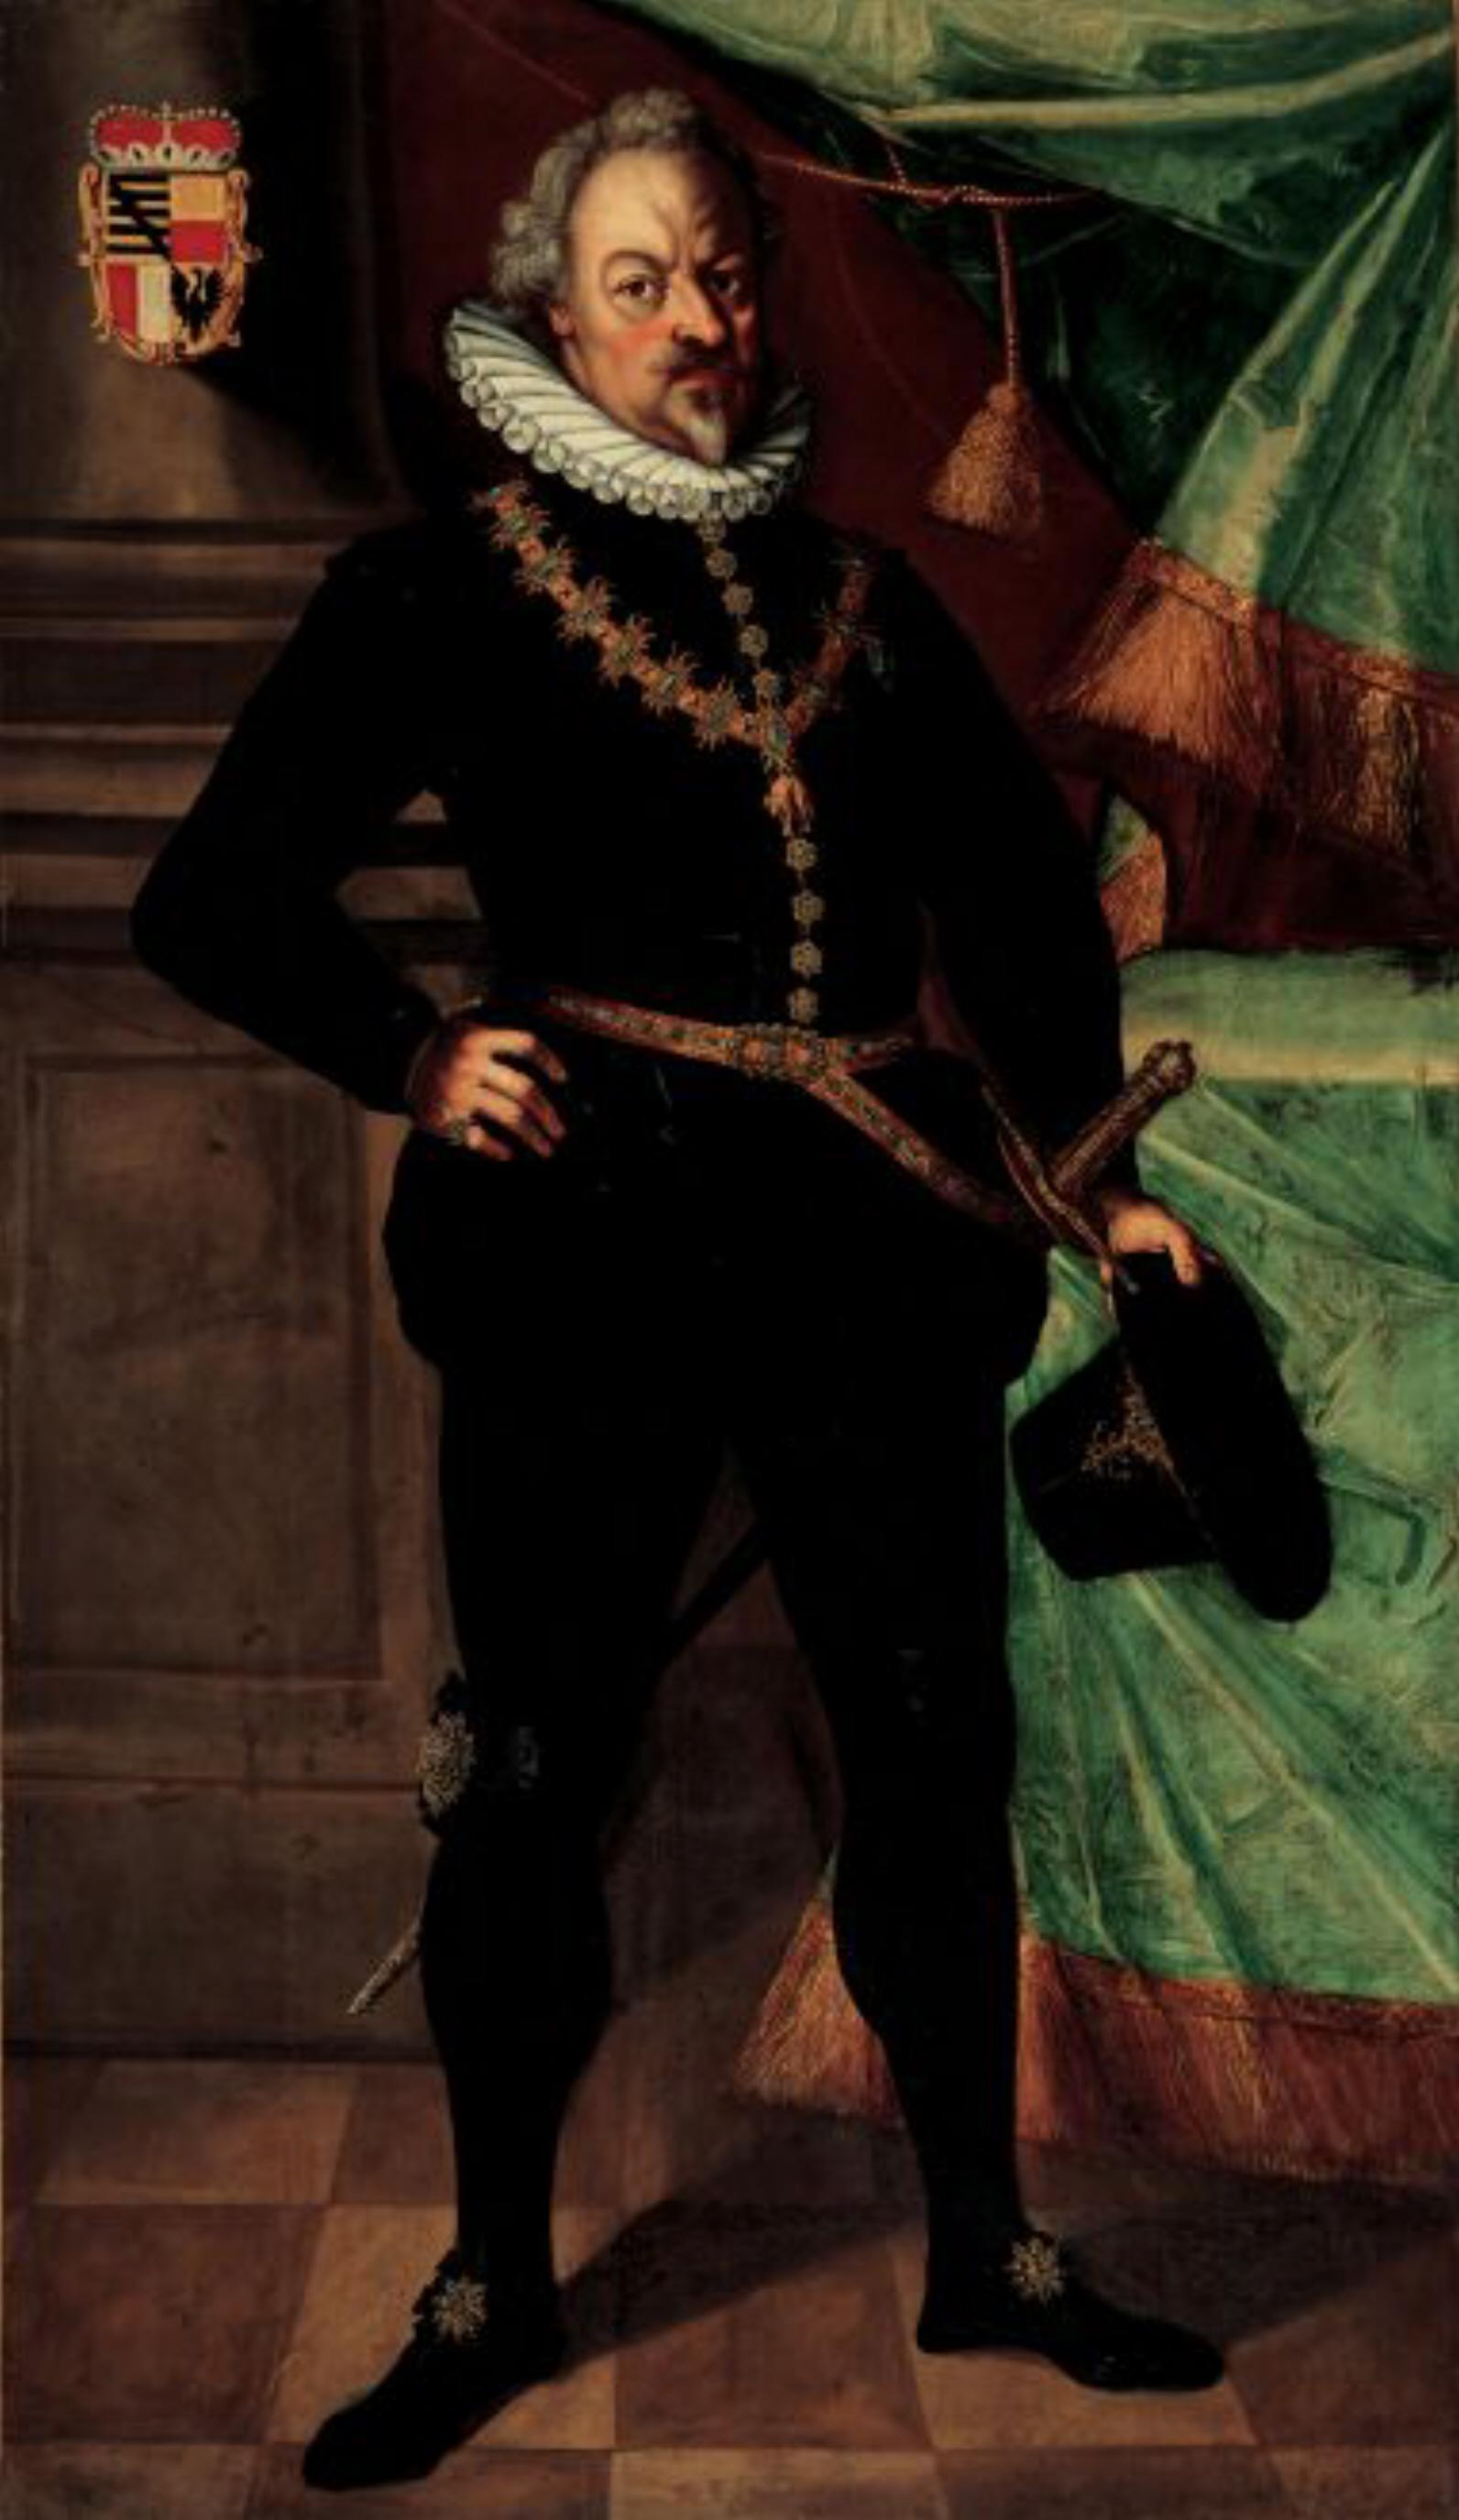 Karl I, Prince of Liechtenstein (30 July 1569 – 12 February 1627), was the first member of the Liechtenstein family to become a Prince of Liechtenstein.